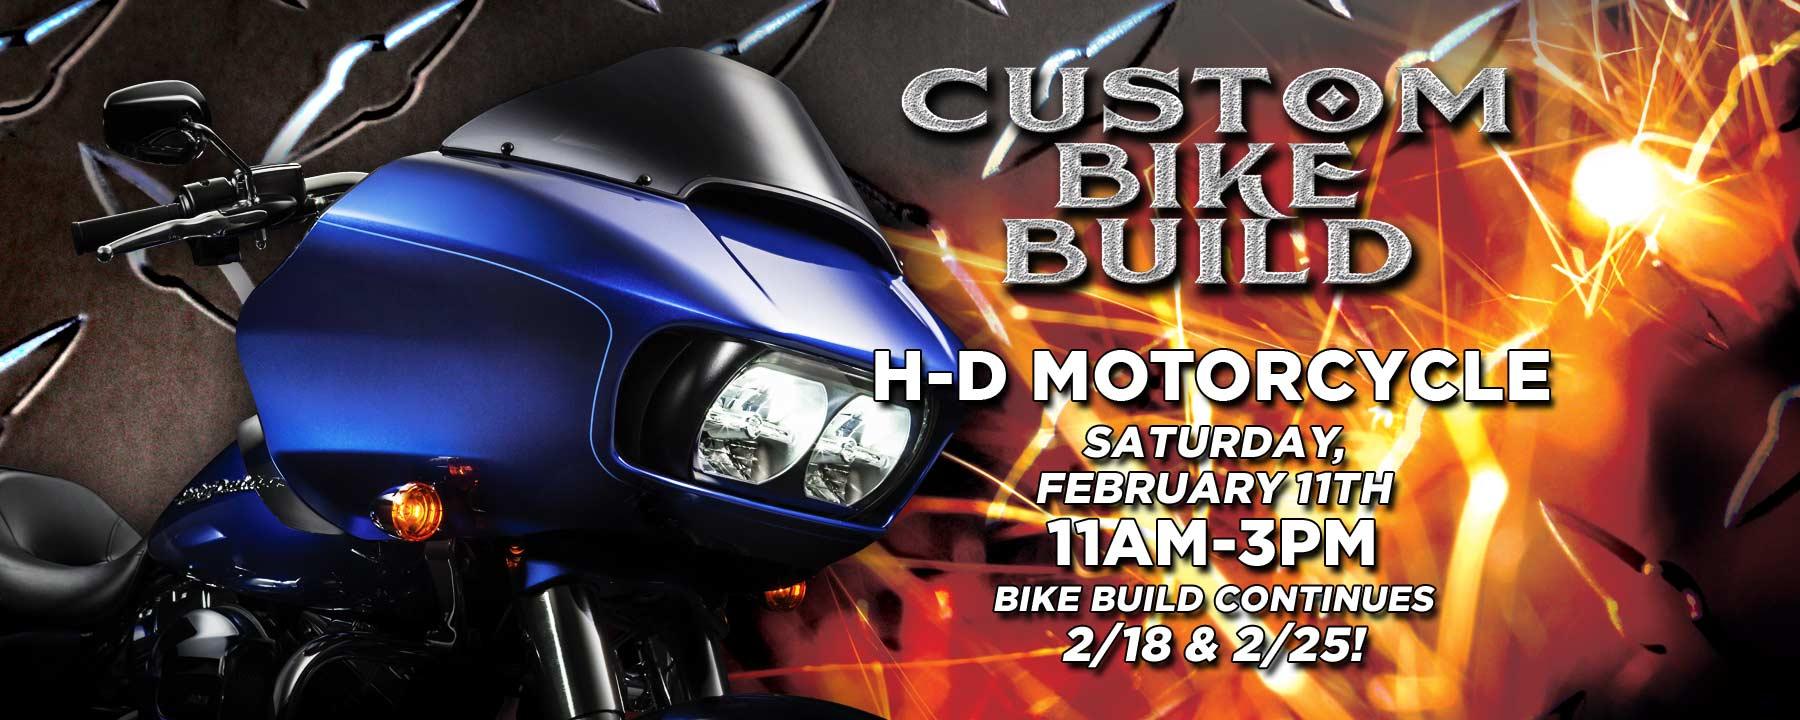 20170211-TMC-1800x720-Custom-Bike-Build